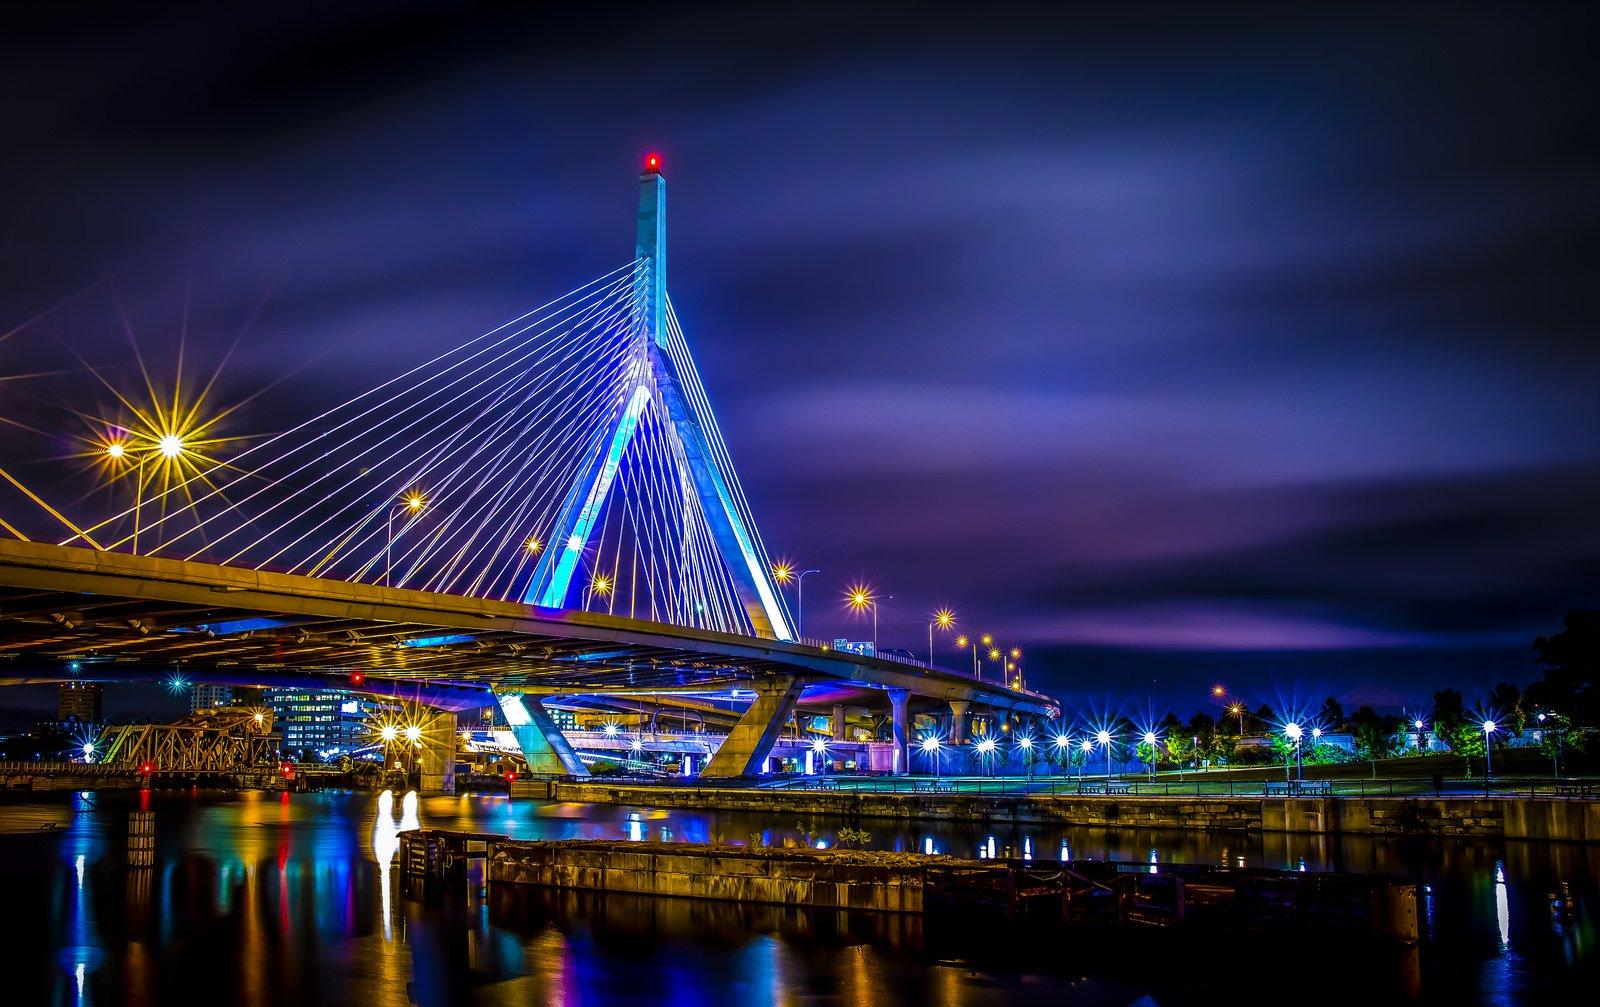 Niagara Falls Hd 1080p Wallpapers Architecture Bridges Boston Boswash Cities City Night